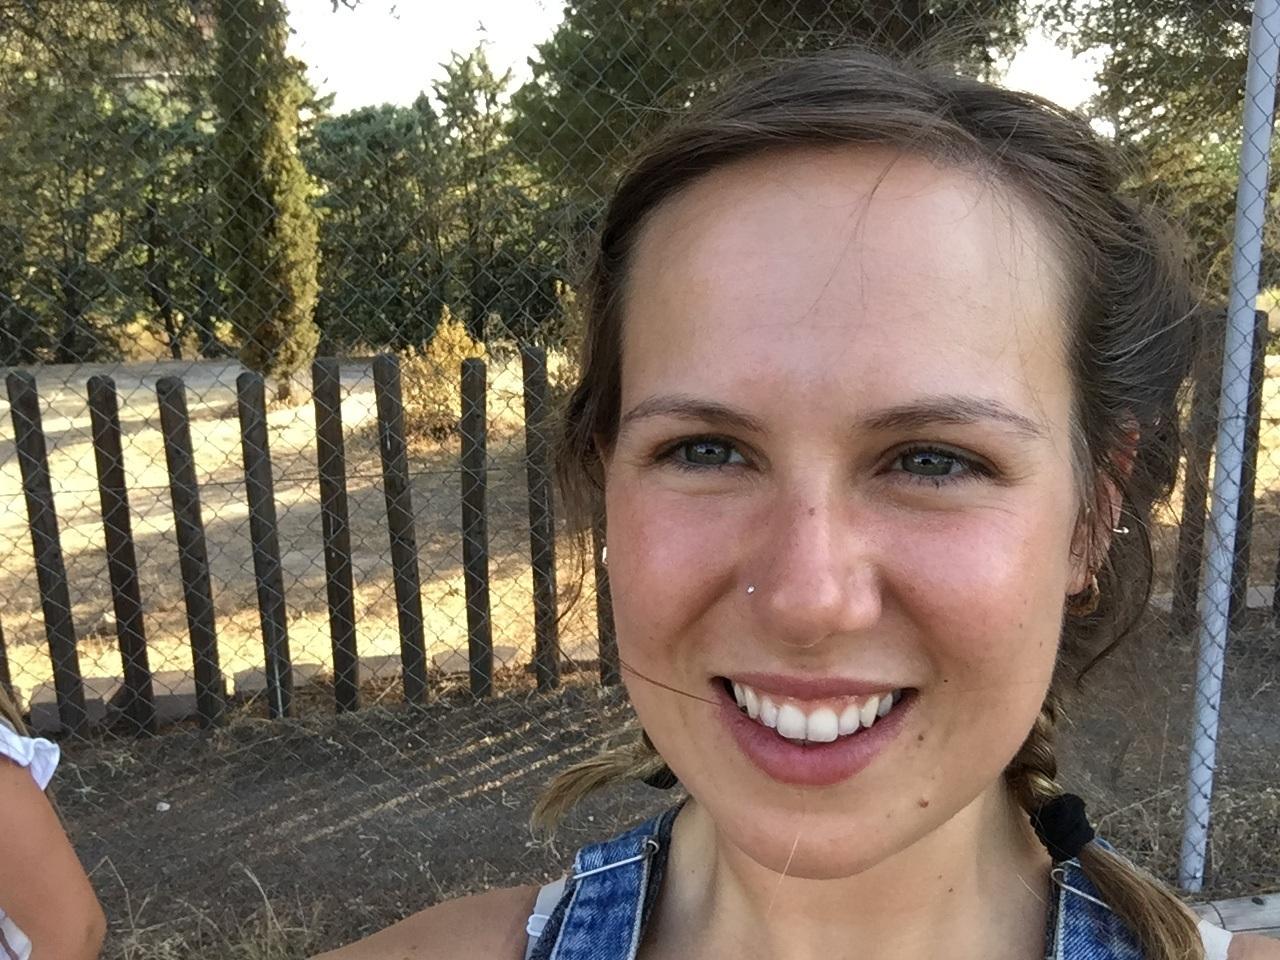 Chloe Georgakis Community Meet Up Participant